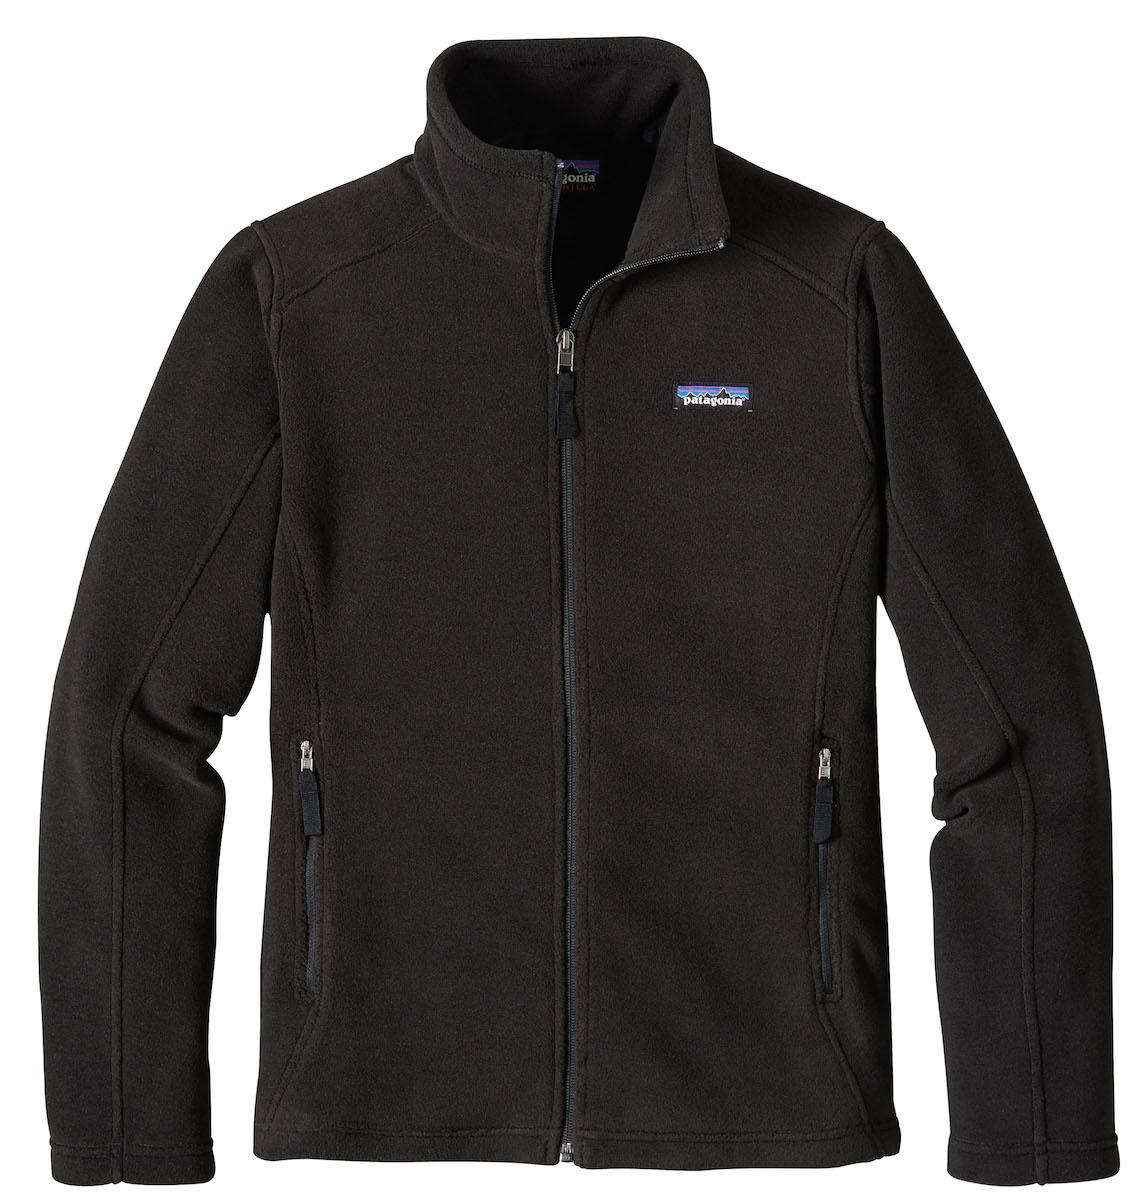 Patagonia Classic Synchilla® Fleece Jacket - Polaire femme